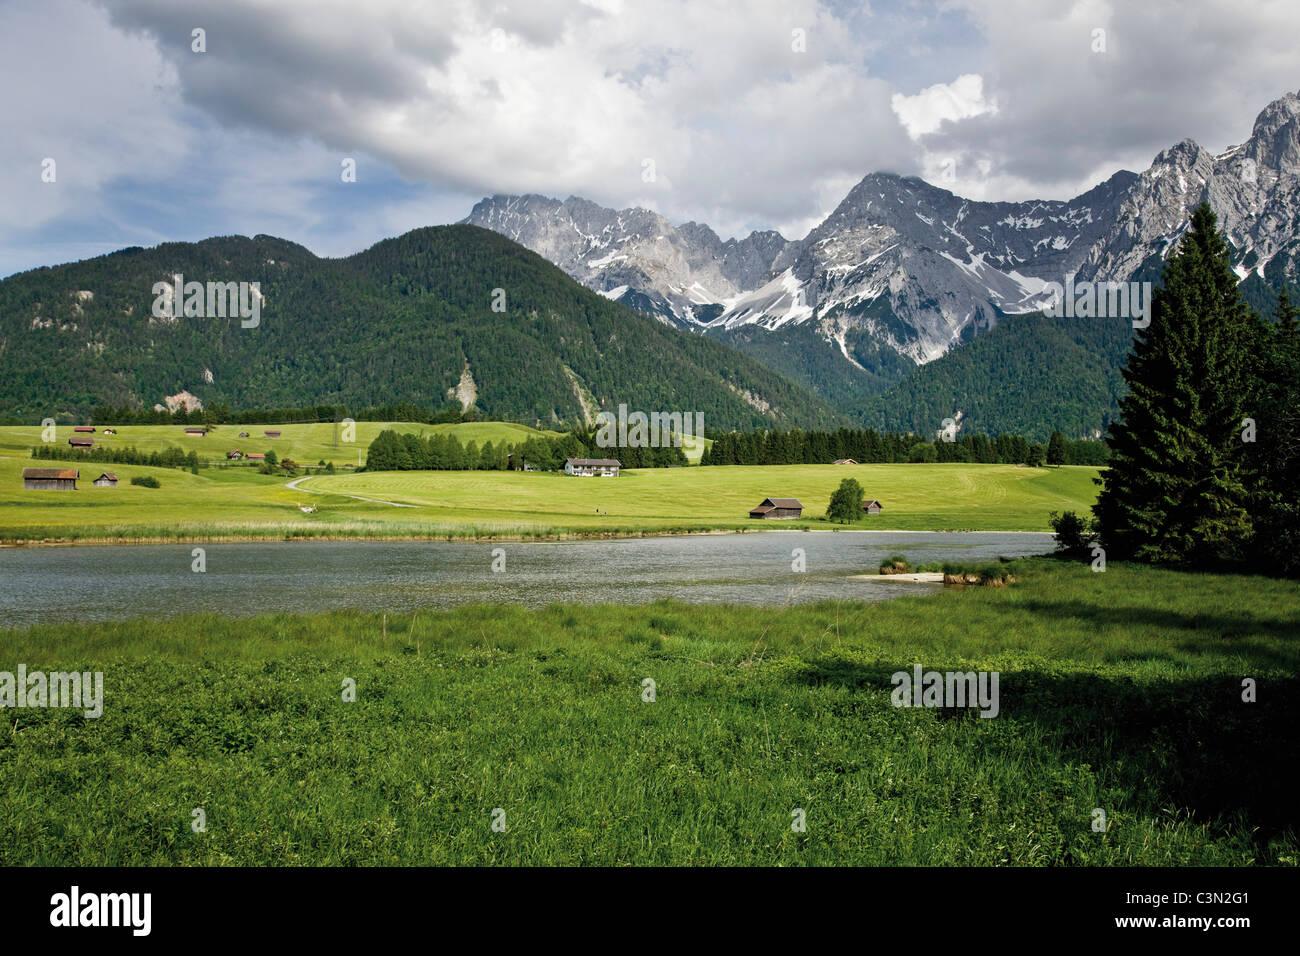 Germany, Bavaria, Lake Schmalsee with Karwendel mountains in background - Stock Image